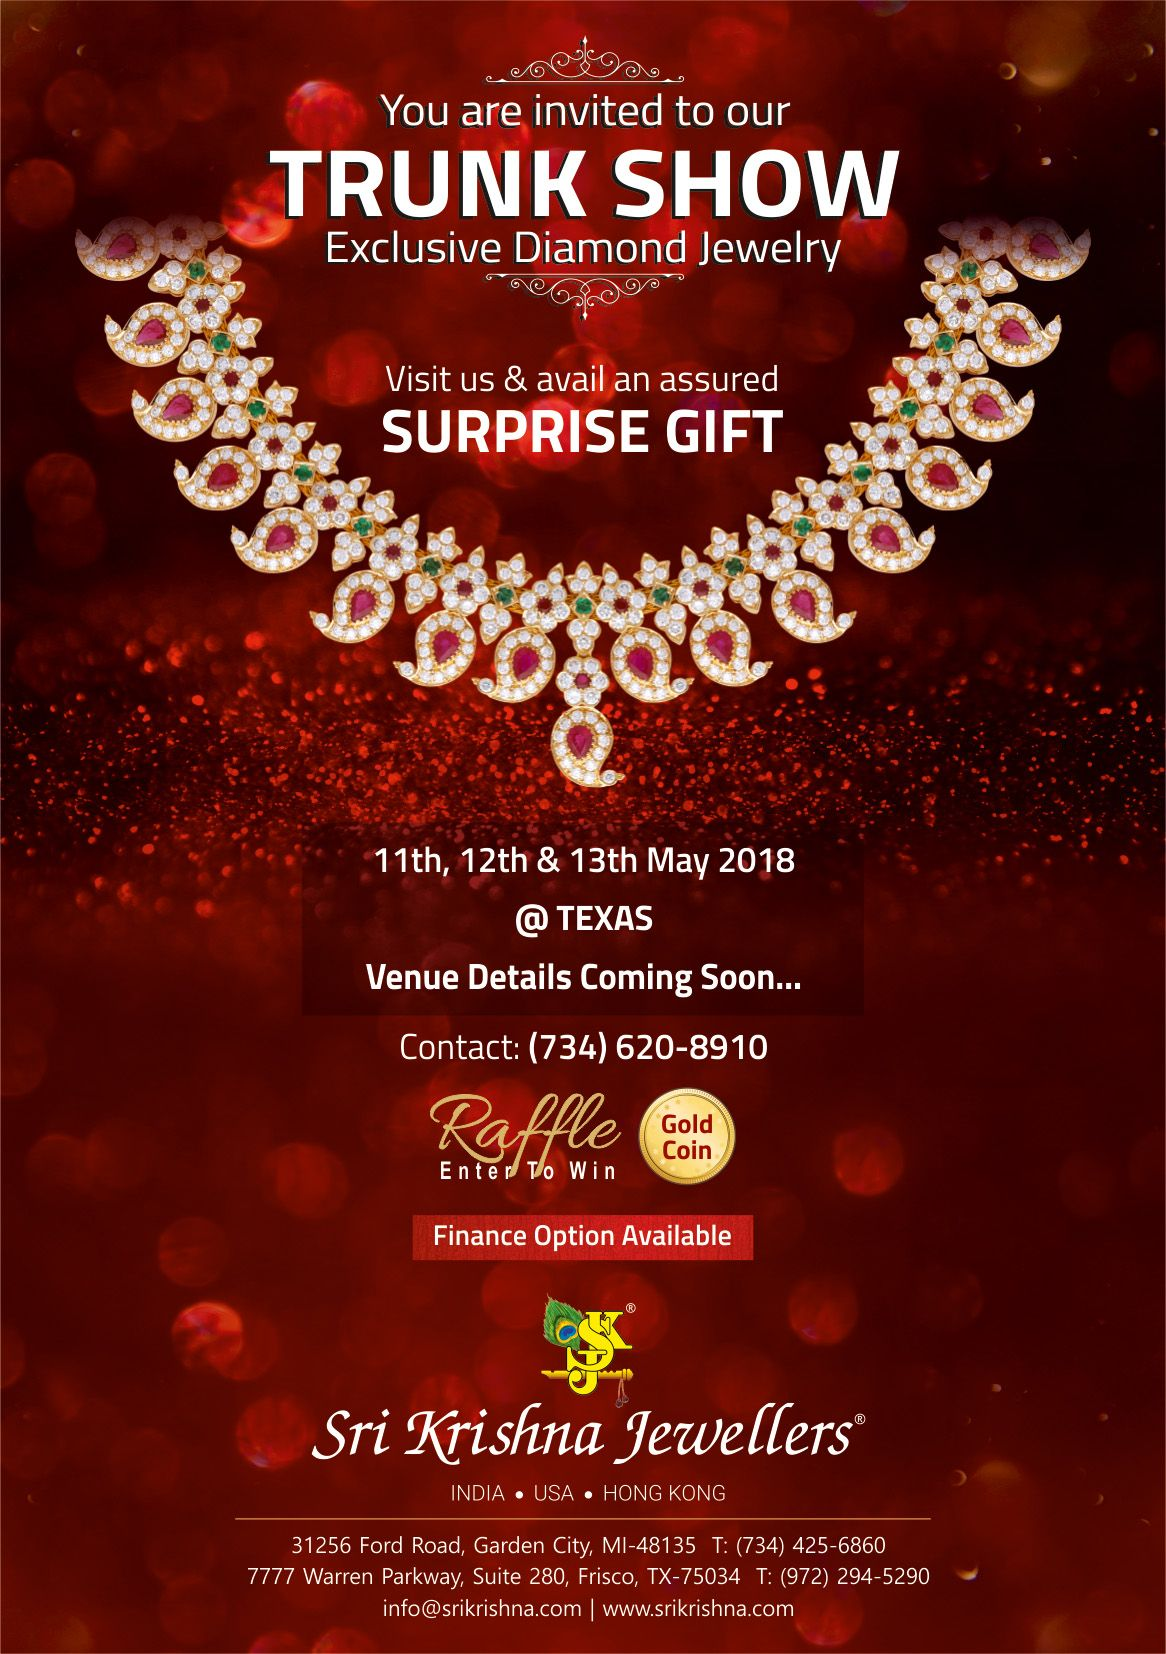 Sri Krishna Jewellers - Trunk Show in Texas: Exclusive Diamond Jewelry